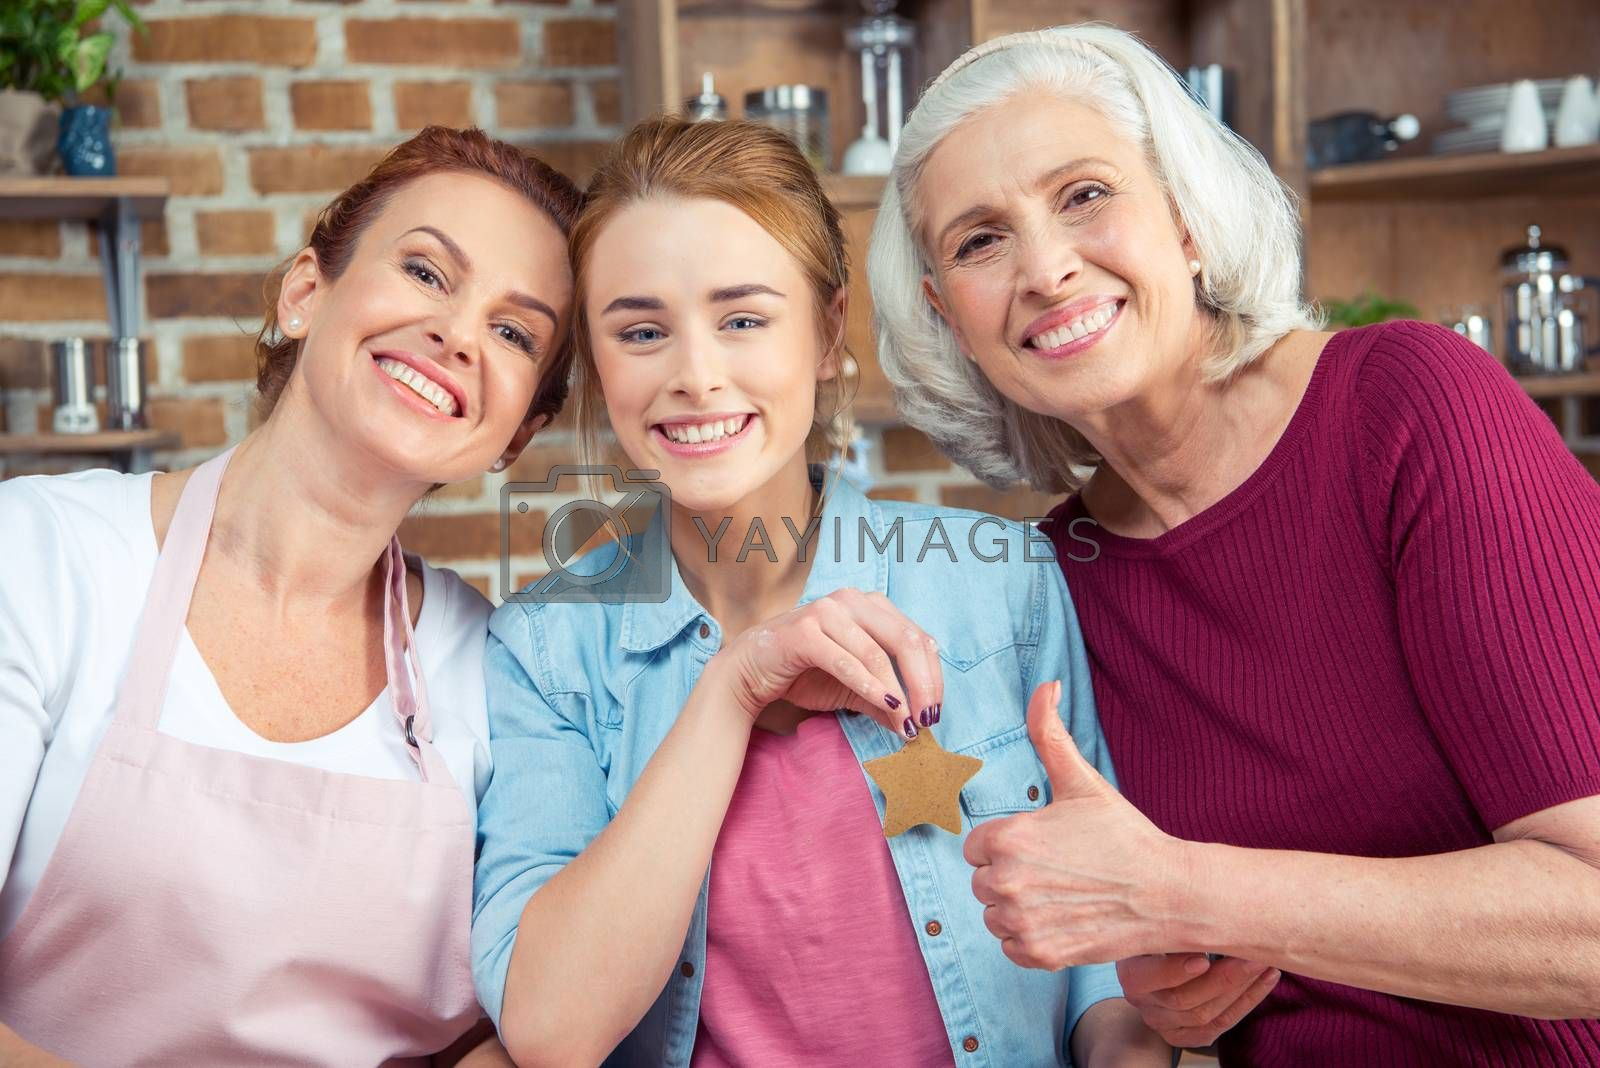 Happy family of three generations smiling and looking at camera. Senior woman showing thumb up